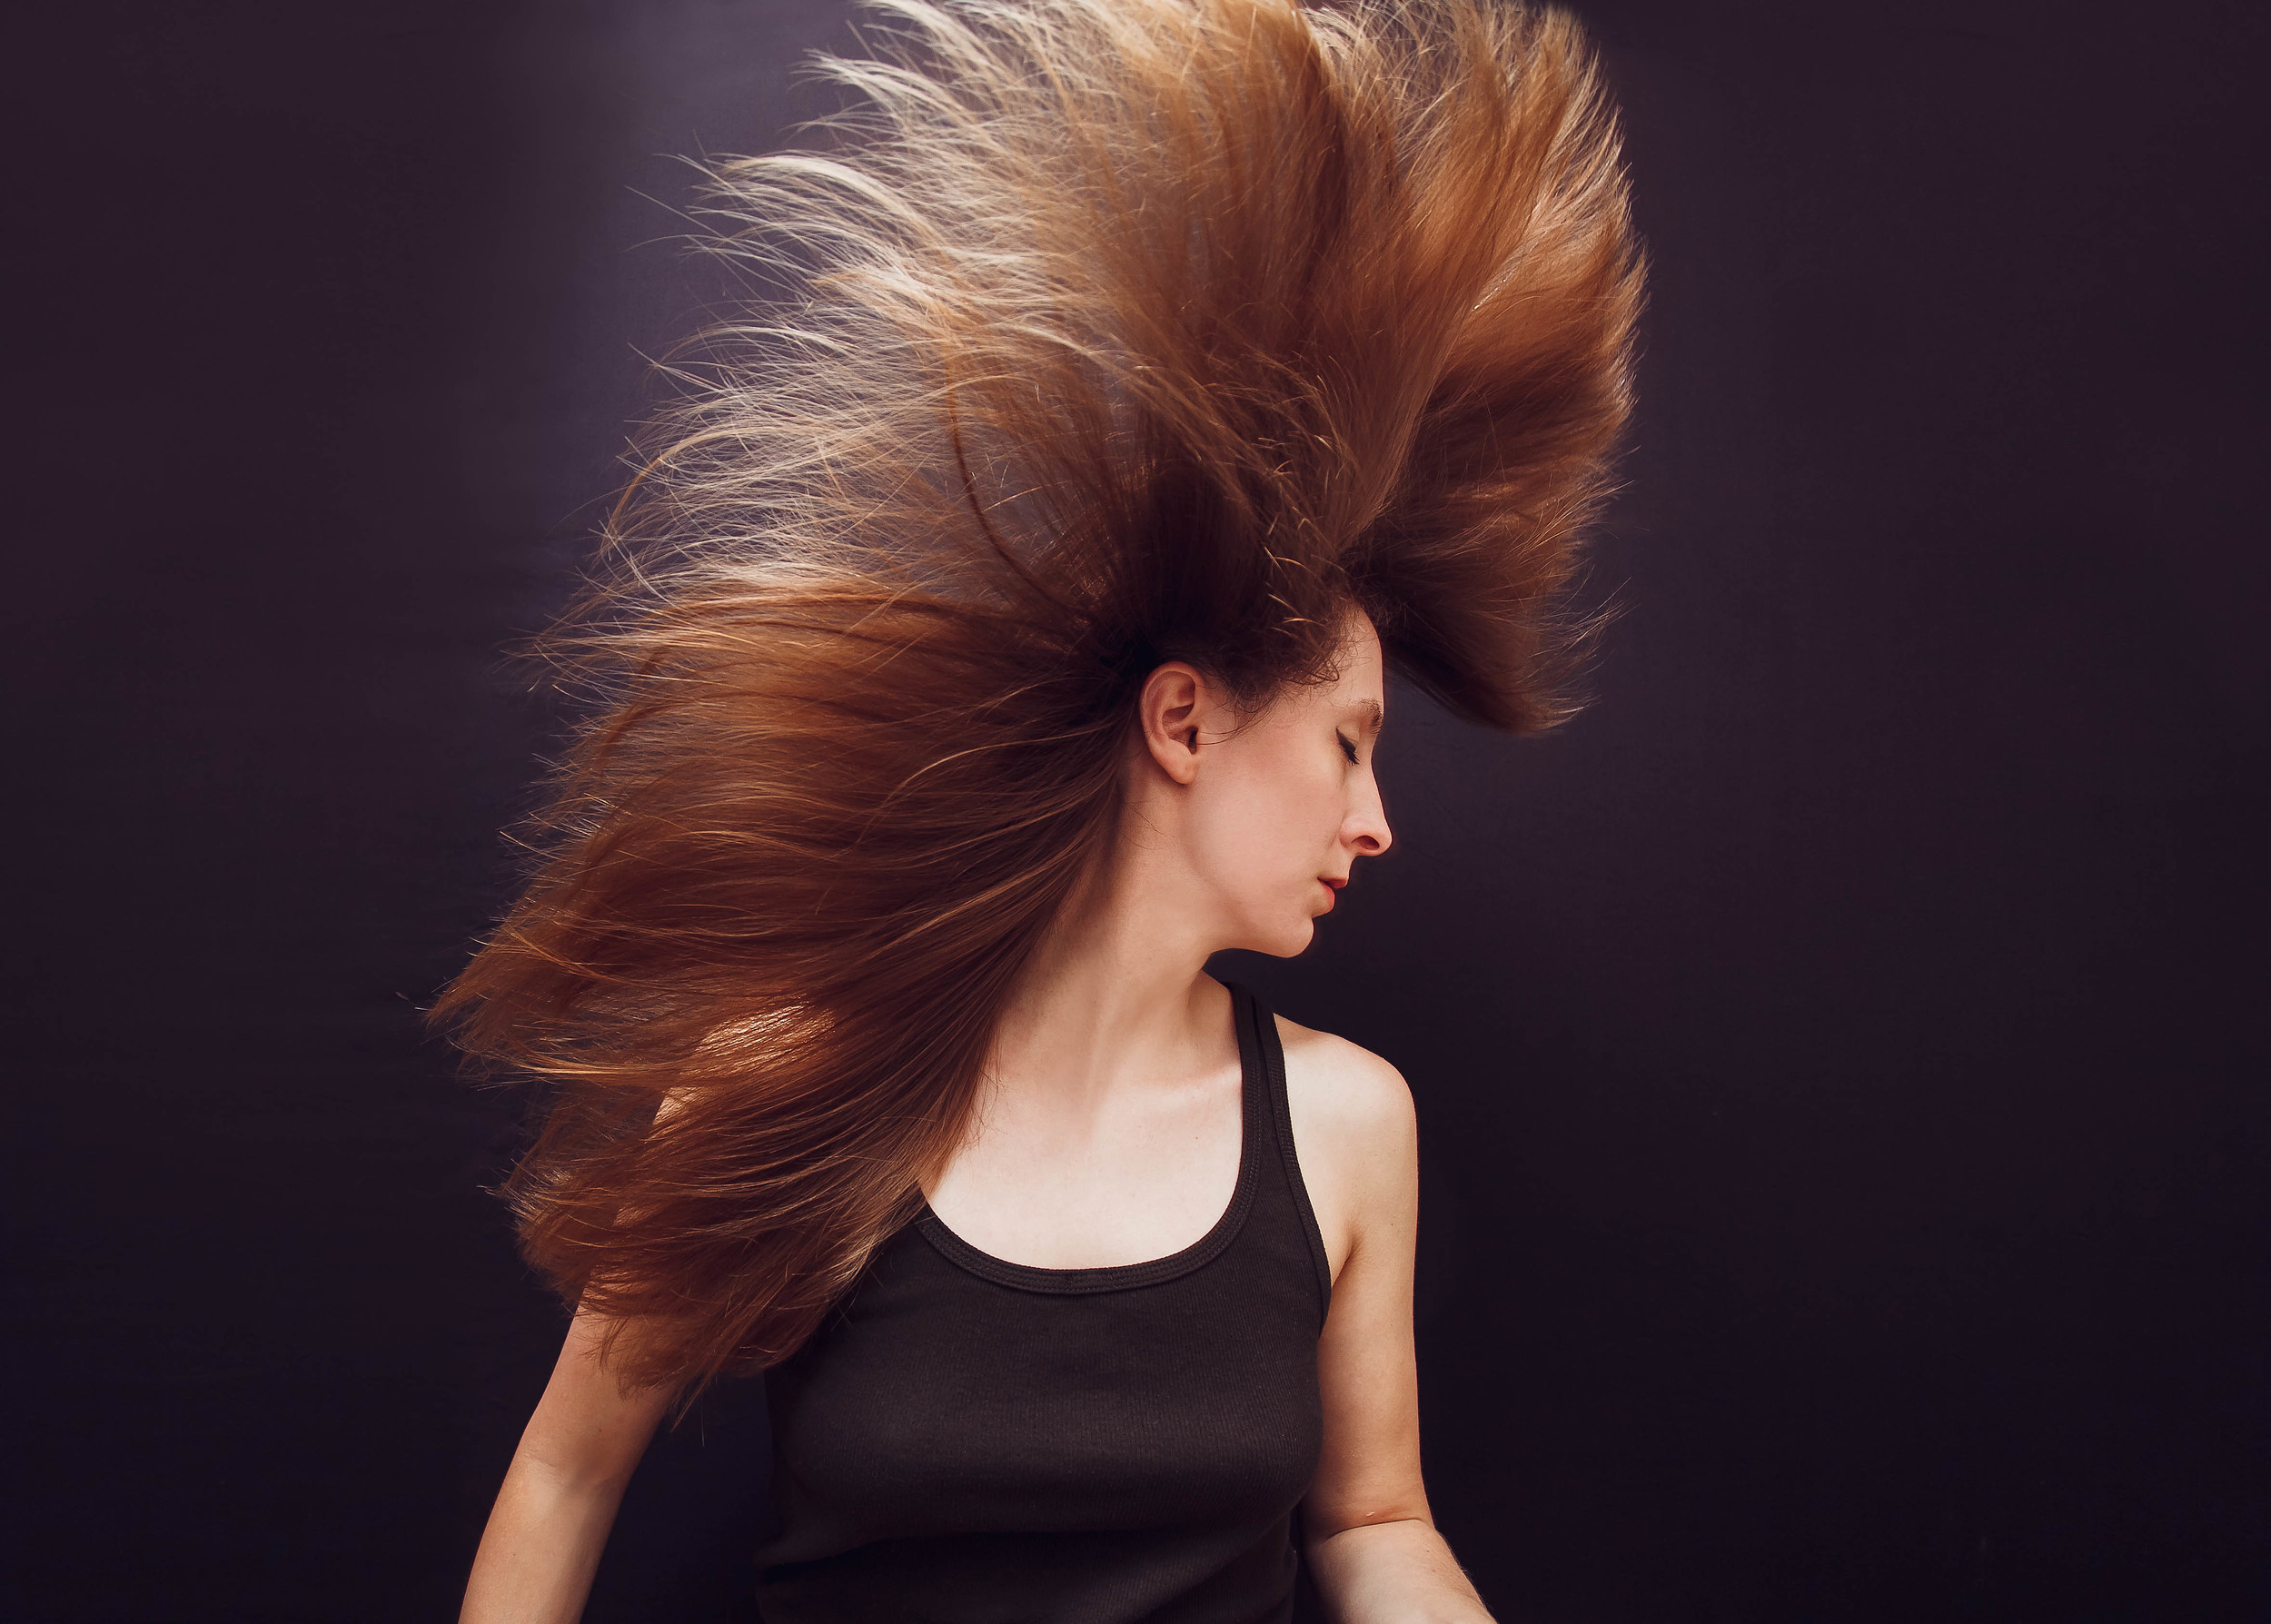 Golden Hair Self Portrait, grand prize winner #202Creates